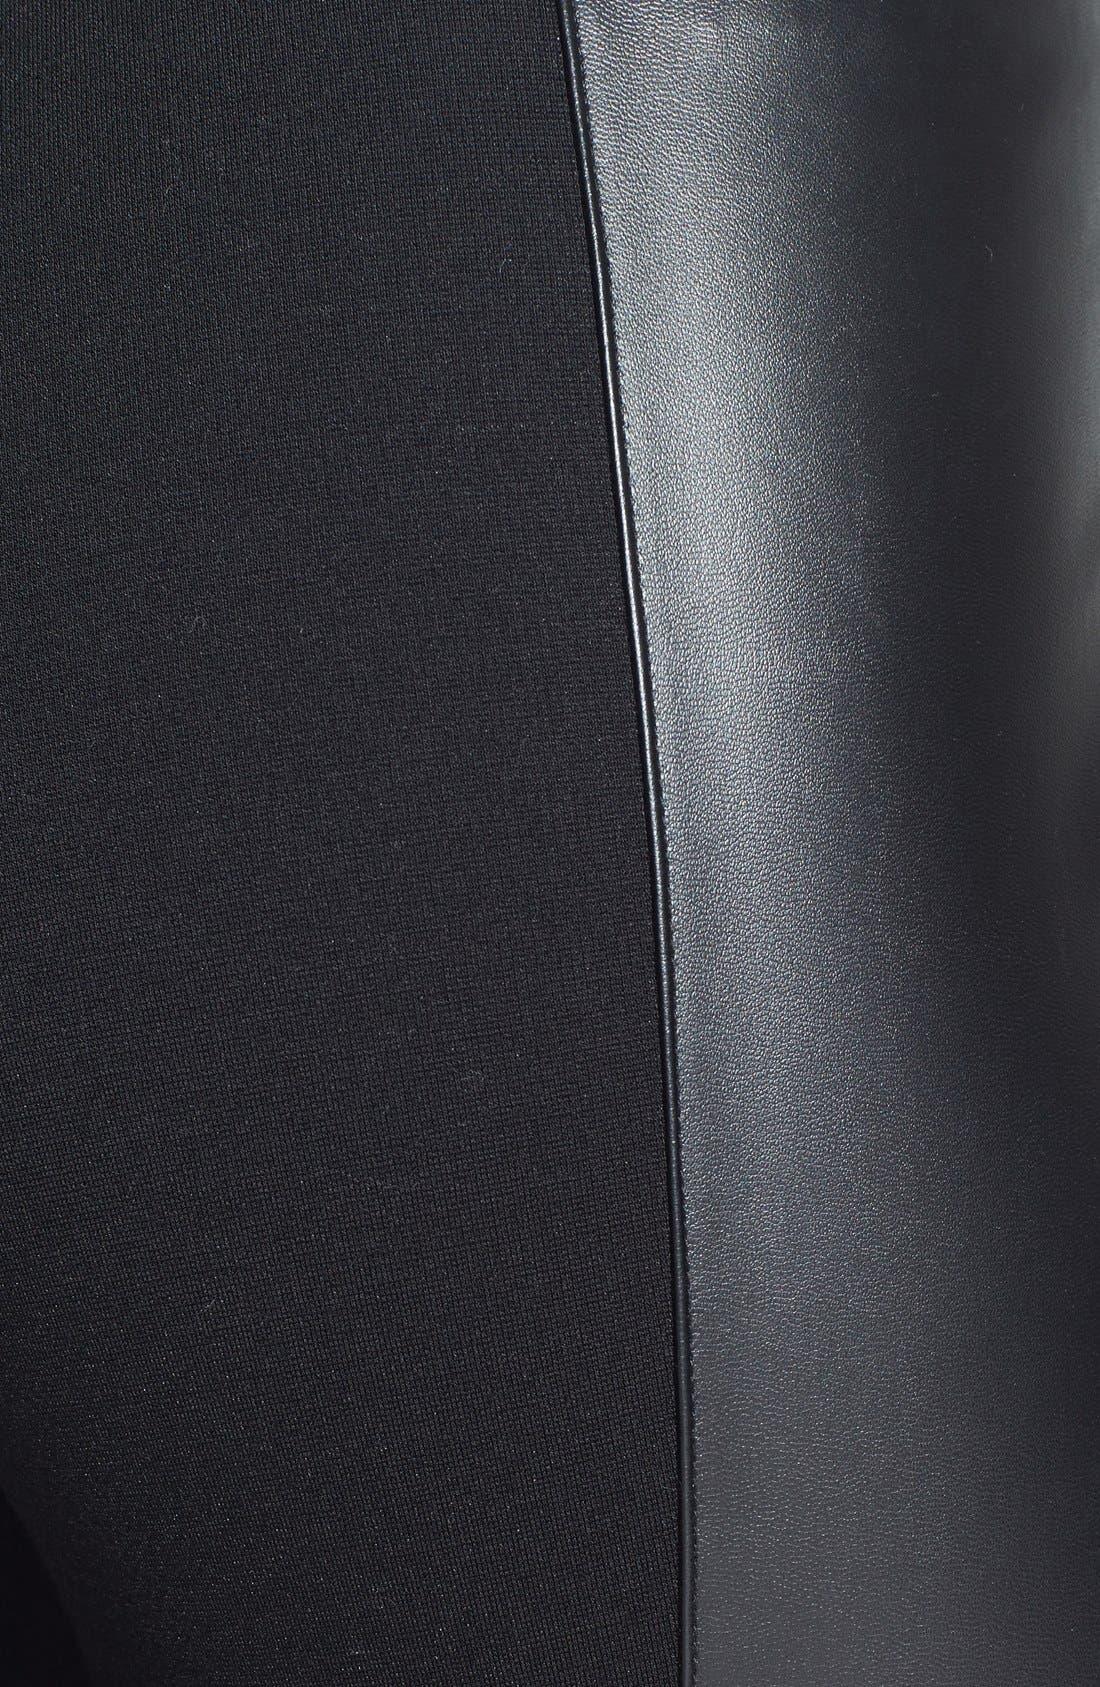 Alternate Image 3  - Nordstrom Faux Leather Stripe Ankle Zip Moto Leggings